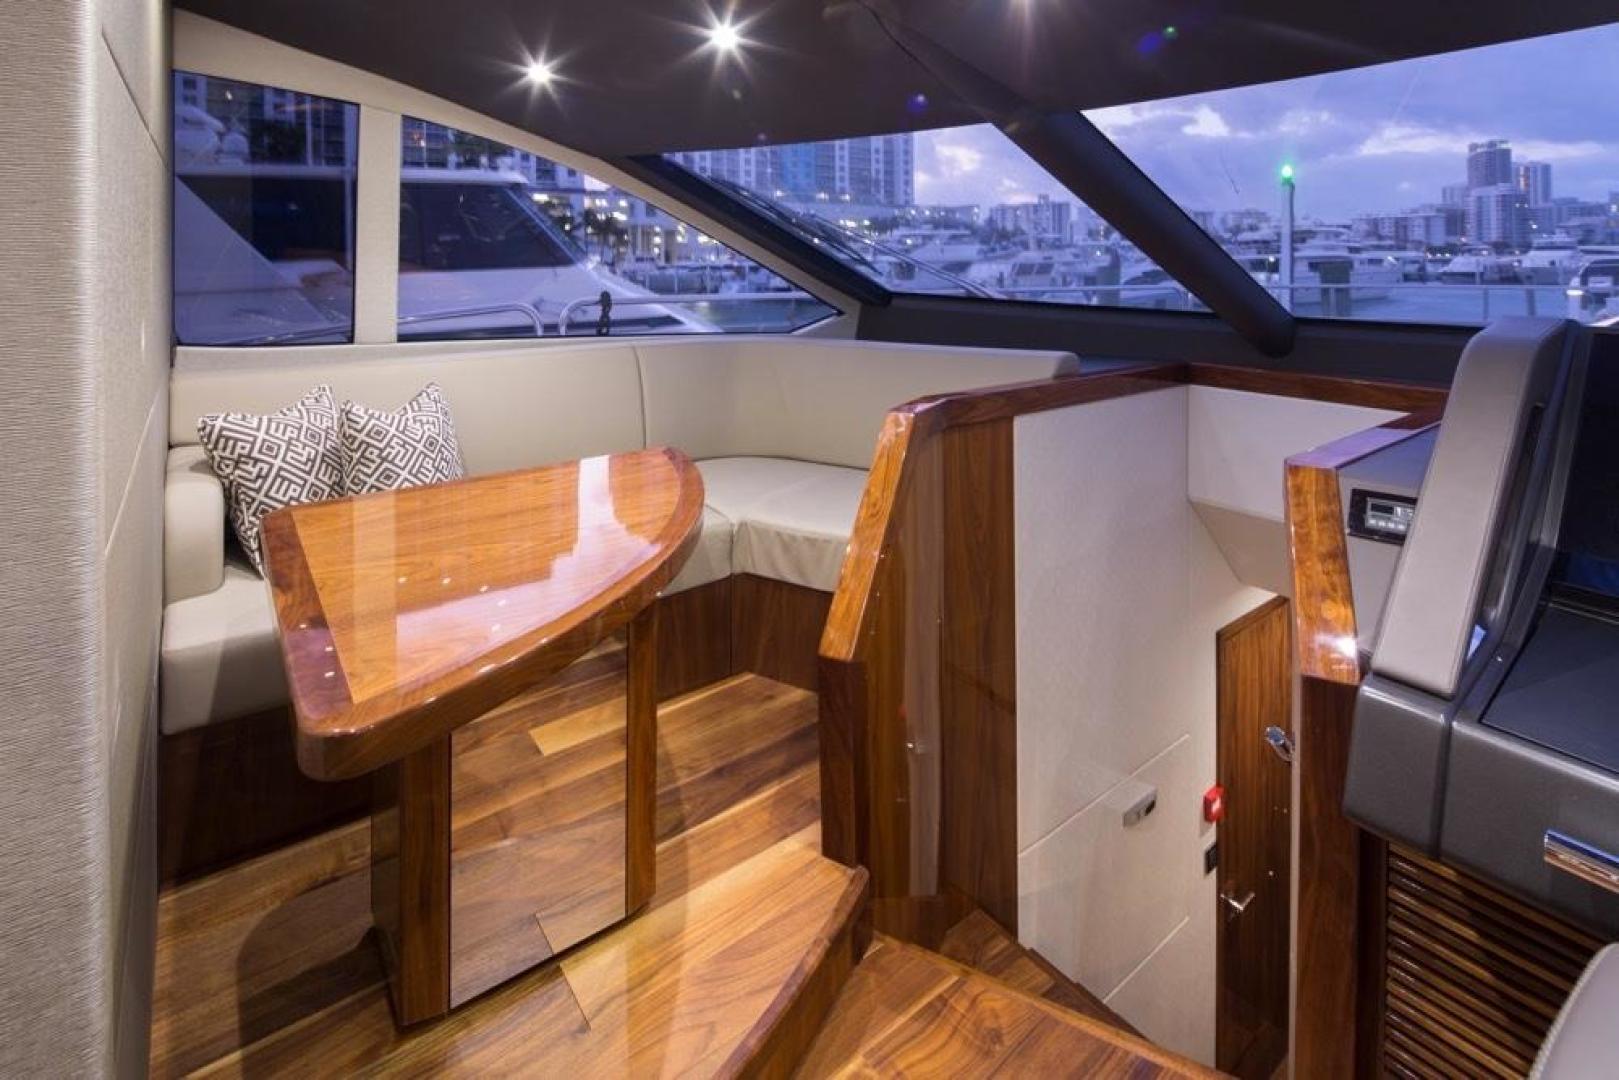 Sunseeker-28 Metre Yacht 2016-RIII Miami-Florida-United States-600102 | Thumbnail